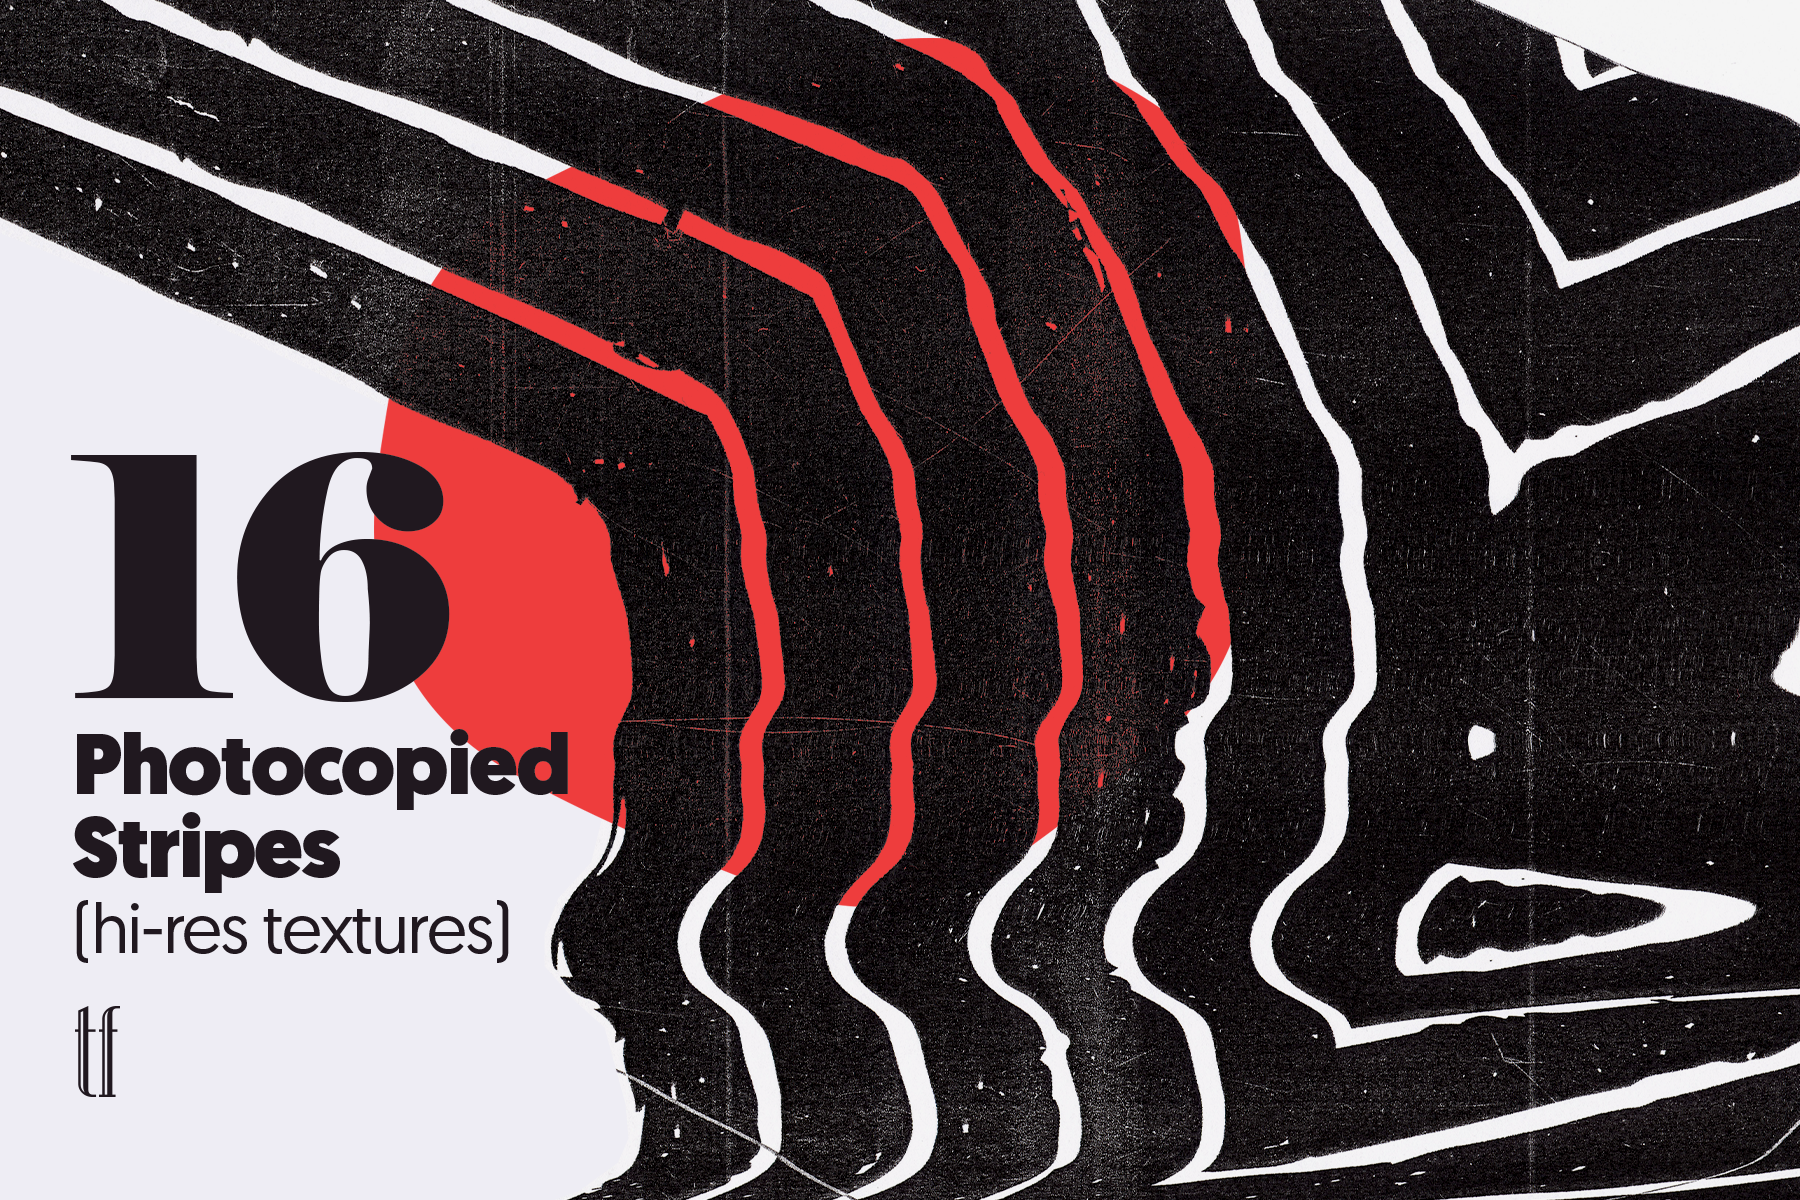 16 Photocopied Stripes example image 1